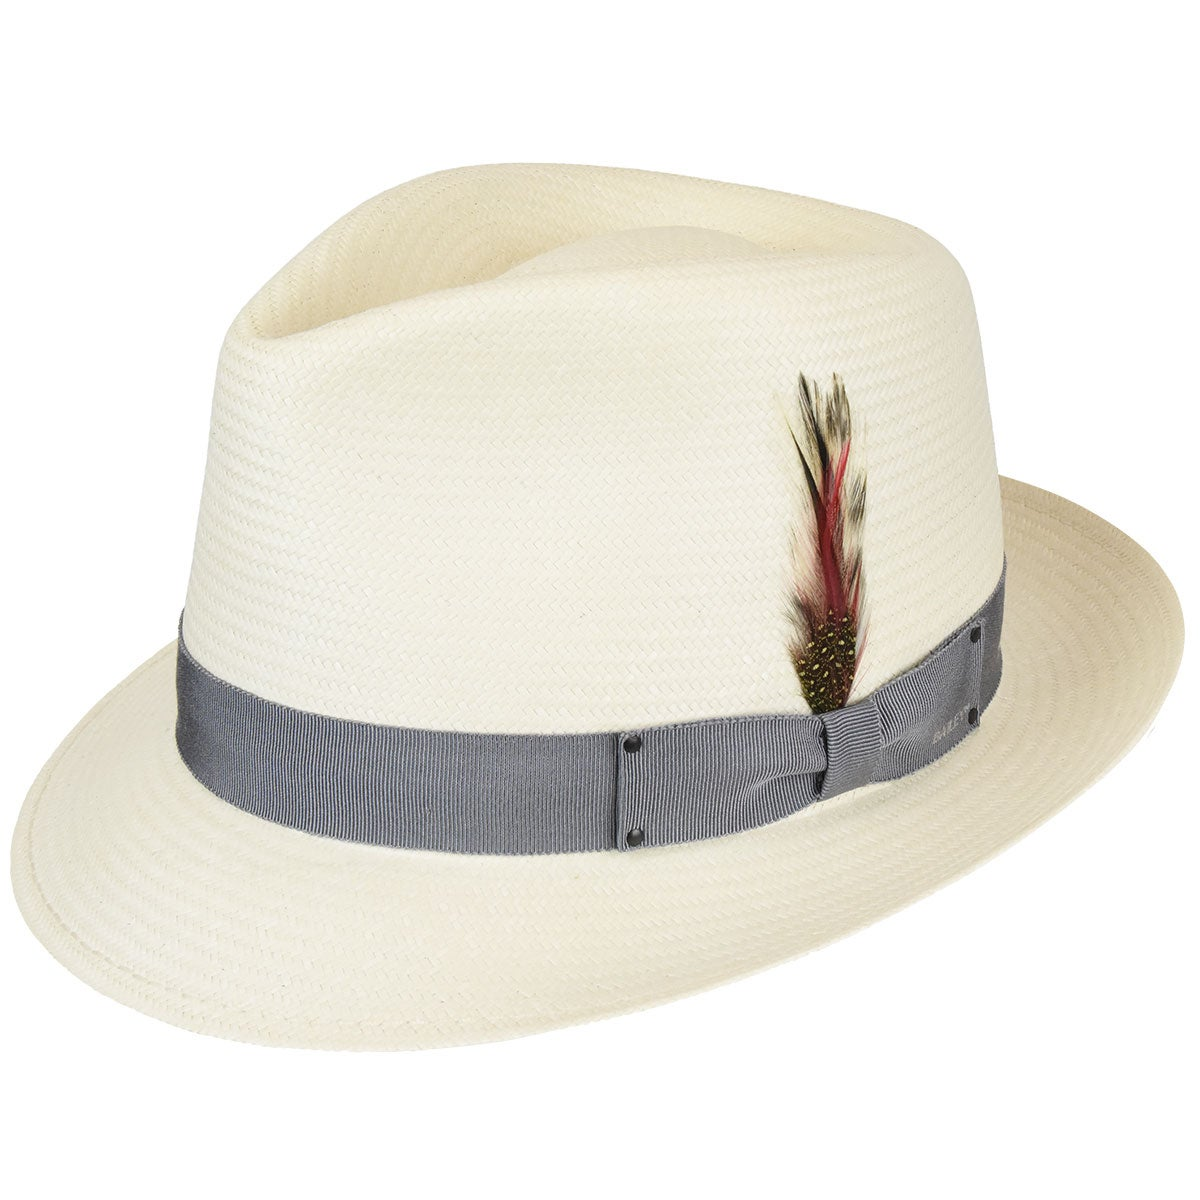 1960s – 70s Style Men's Hats Guthrie LitestrawFedora $130.00 AT vintagedancer.com